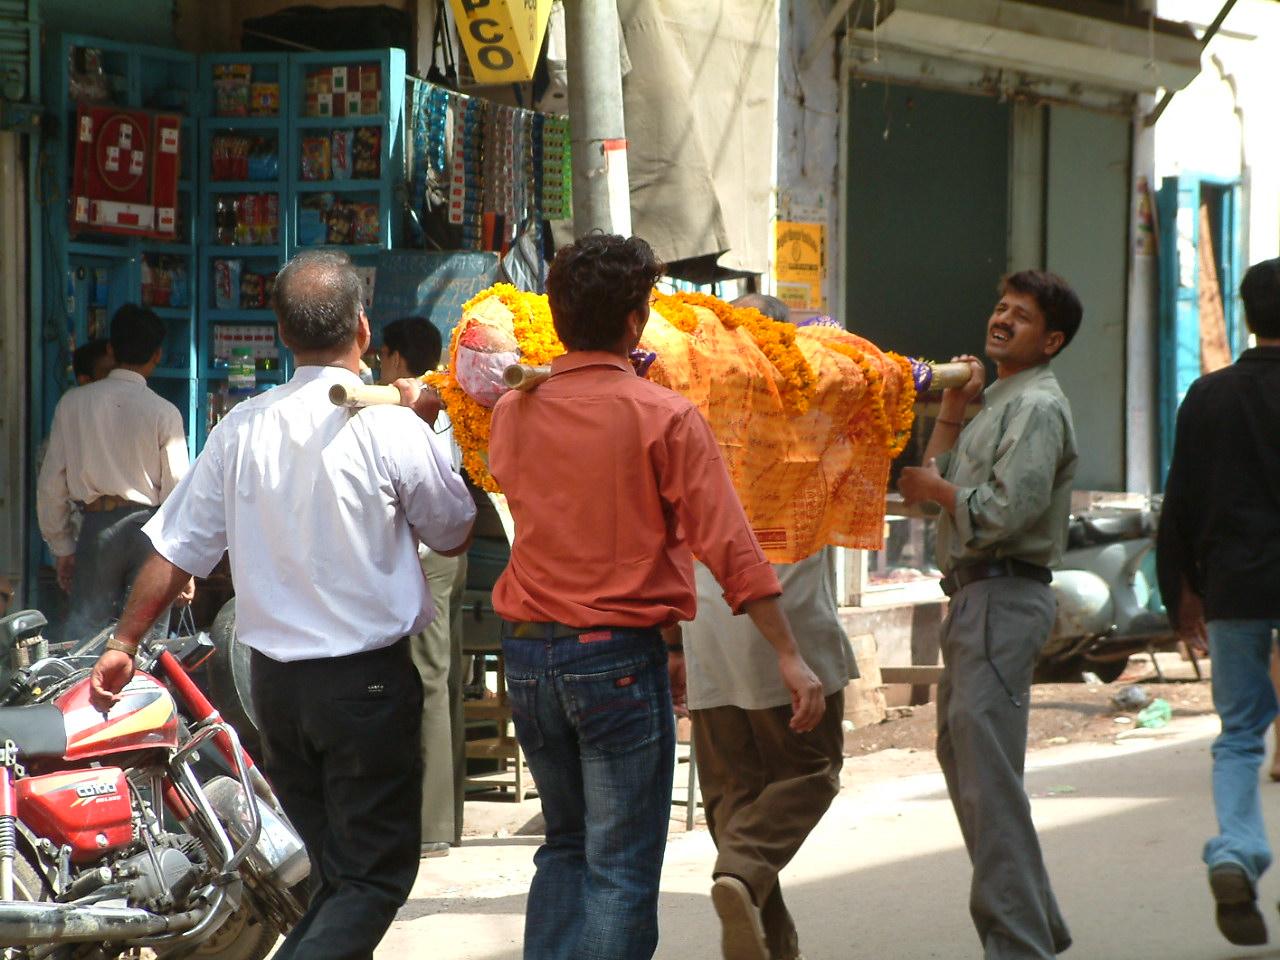 24 juli 2005 Kharujaho – Varanassi